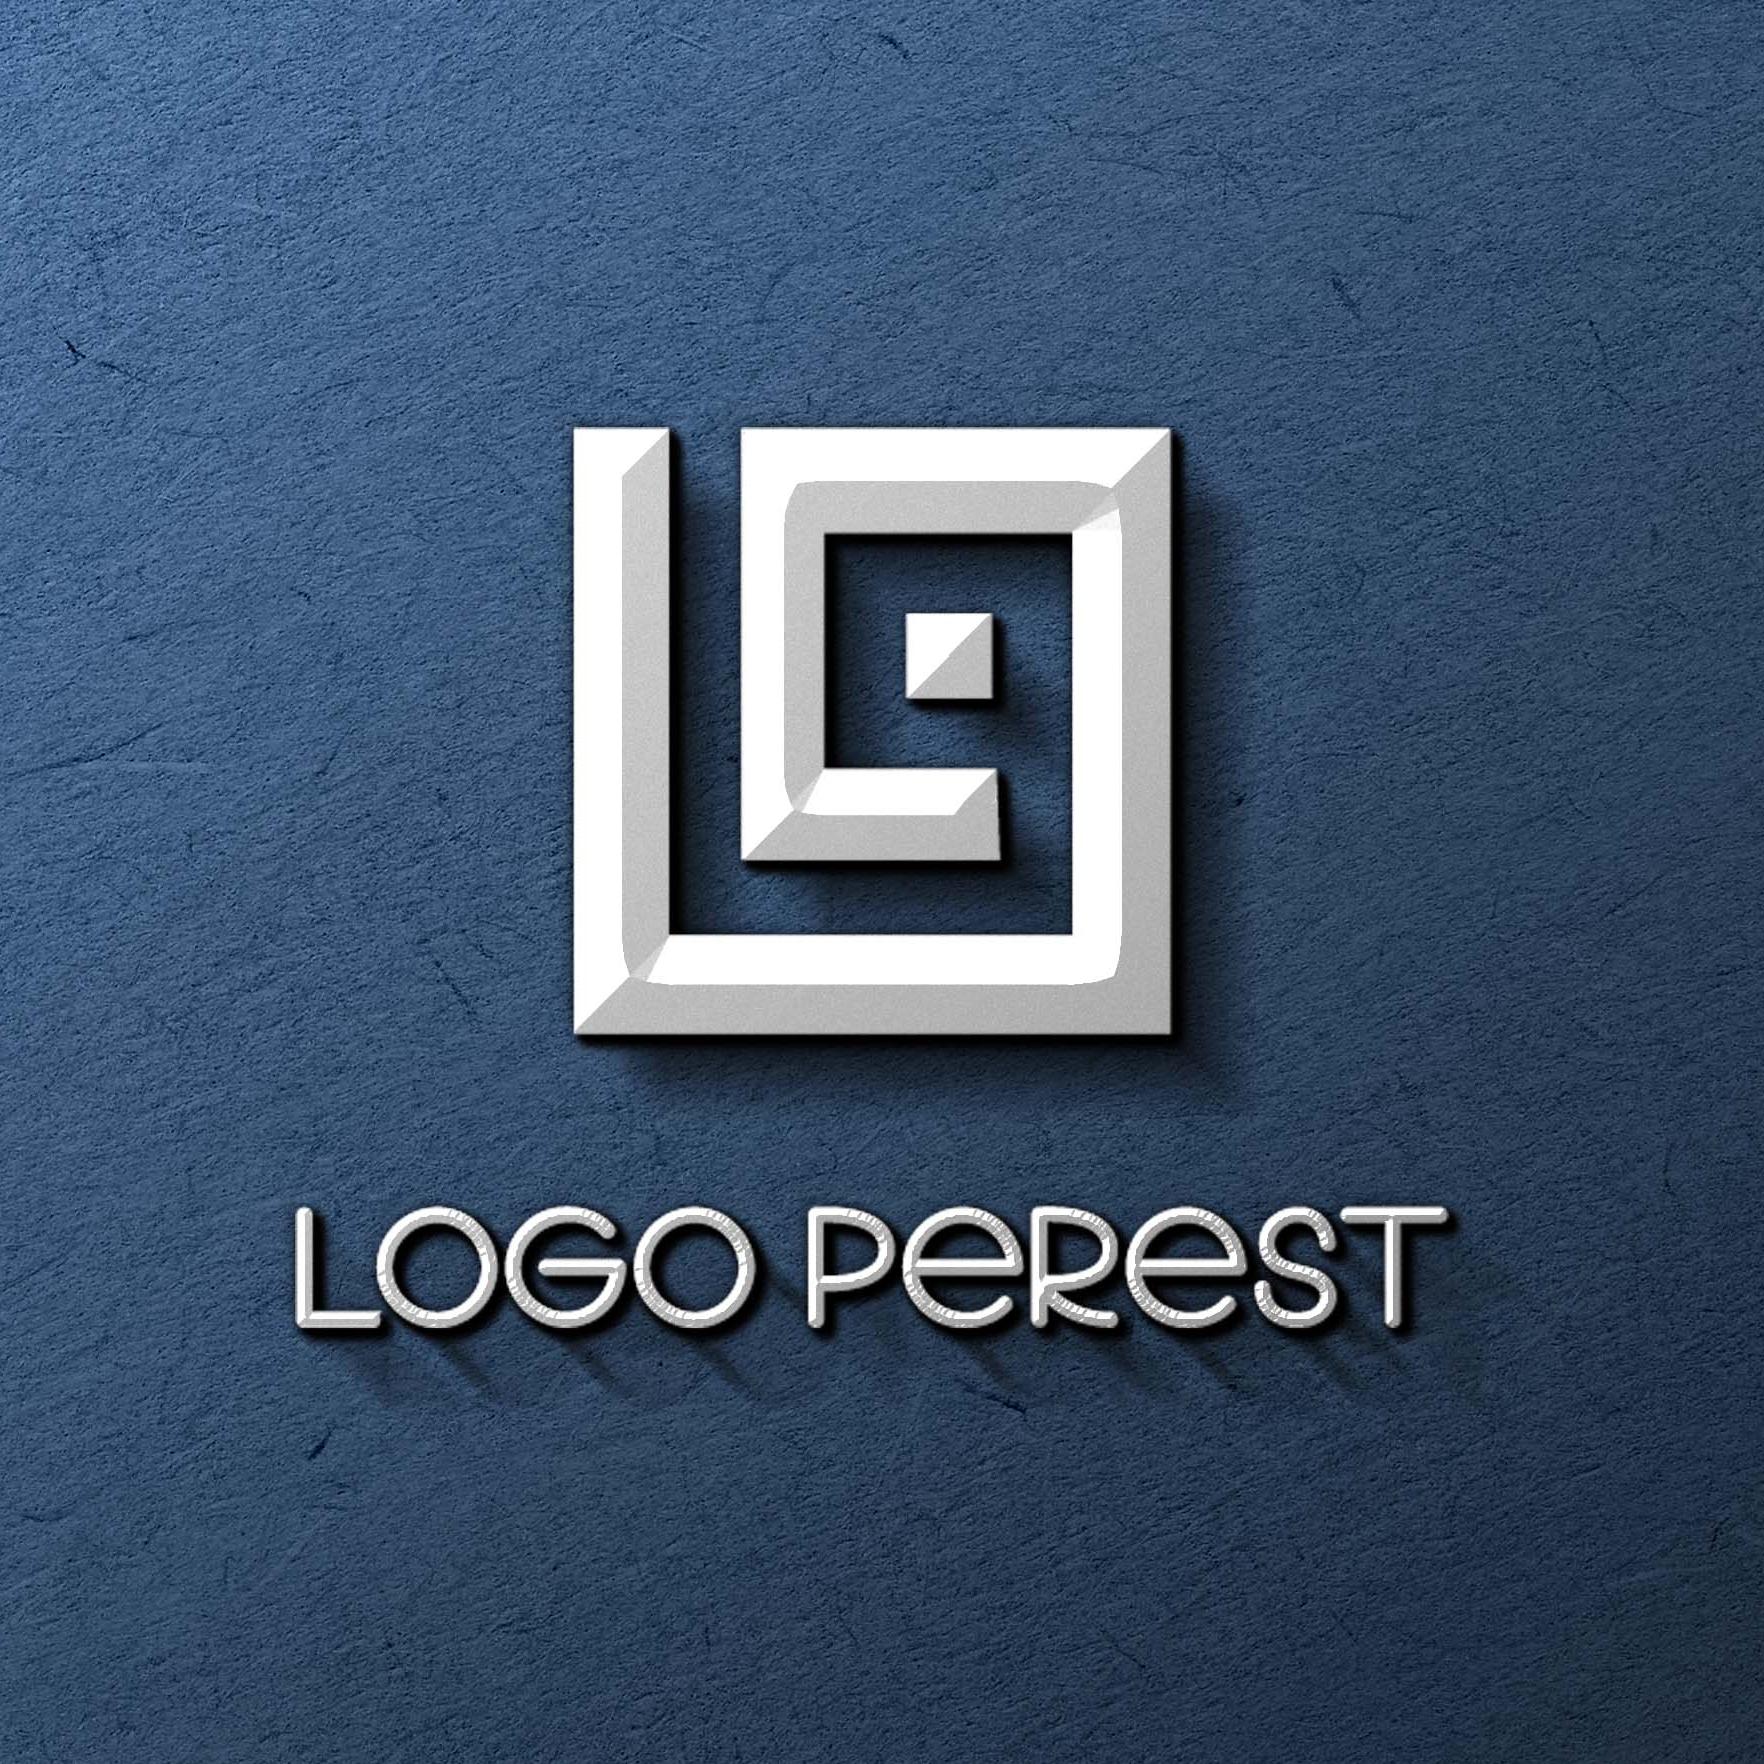 Logoperest